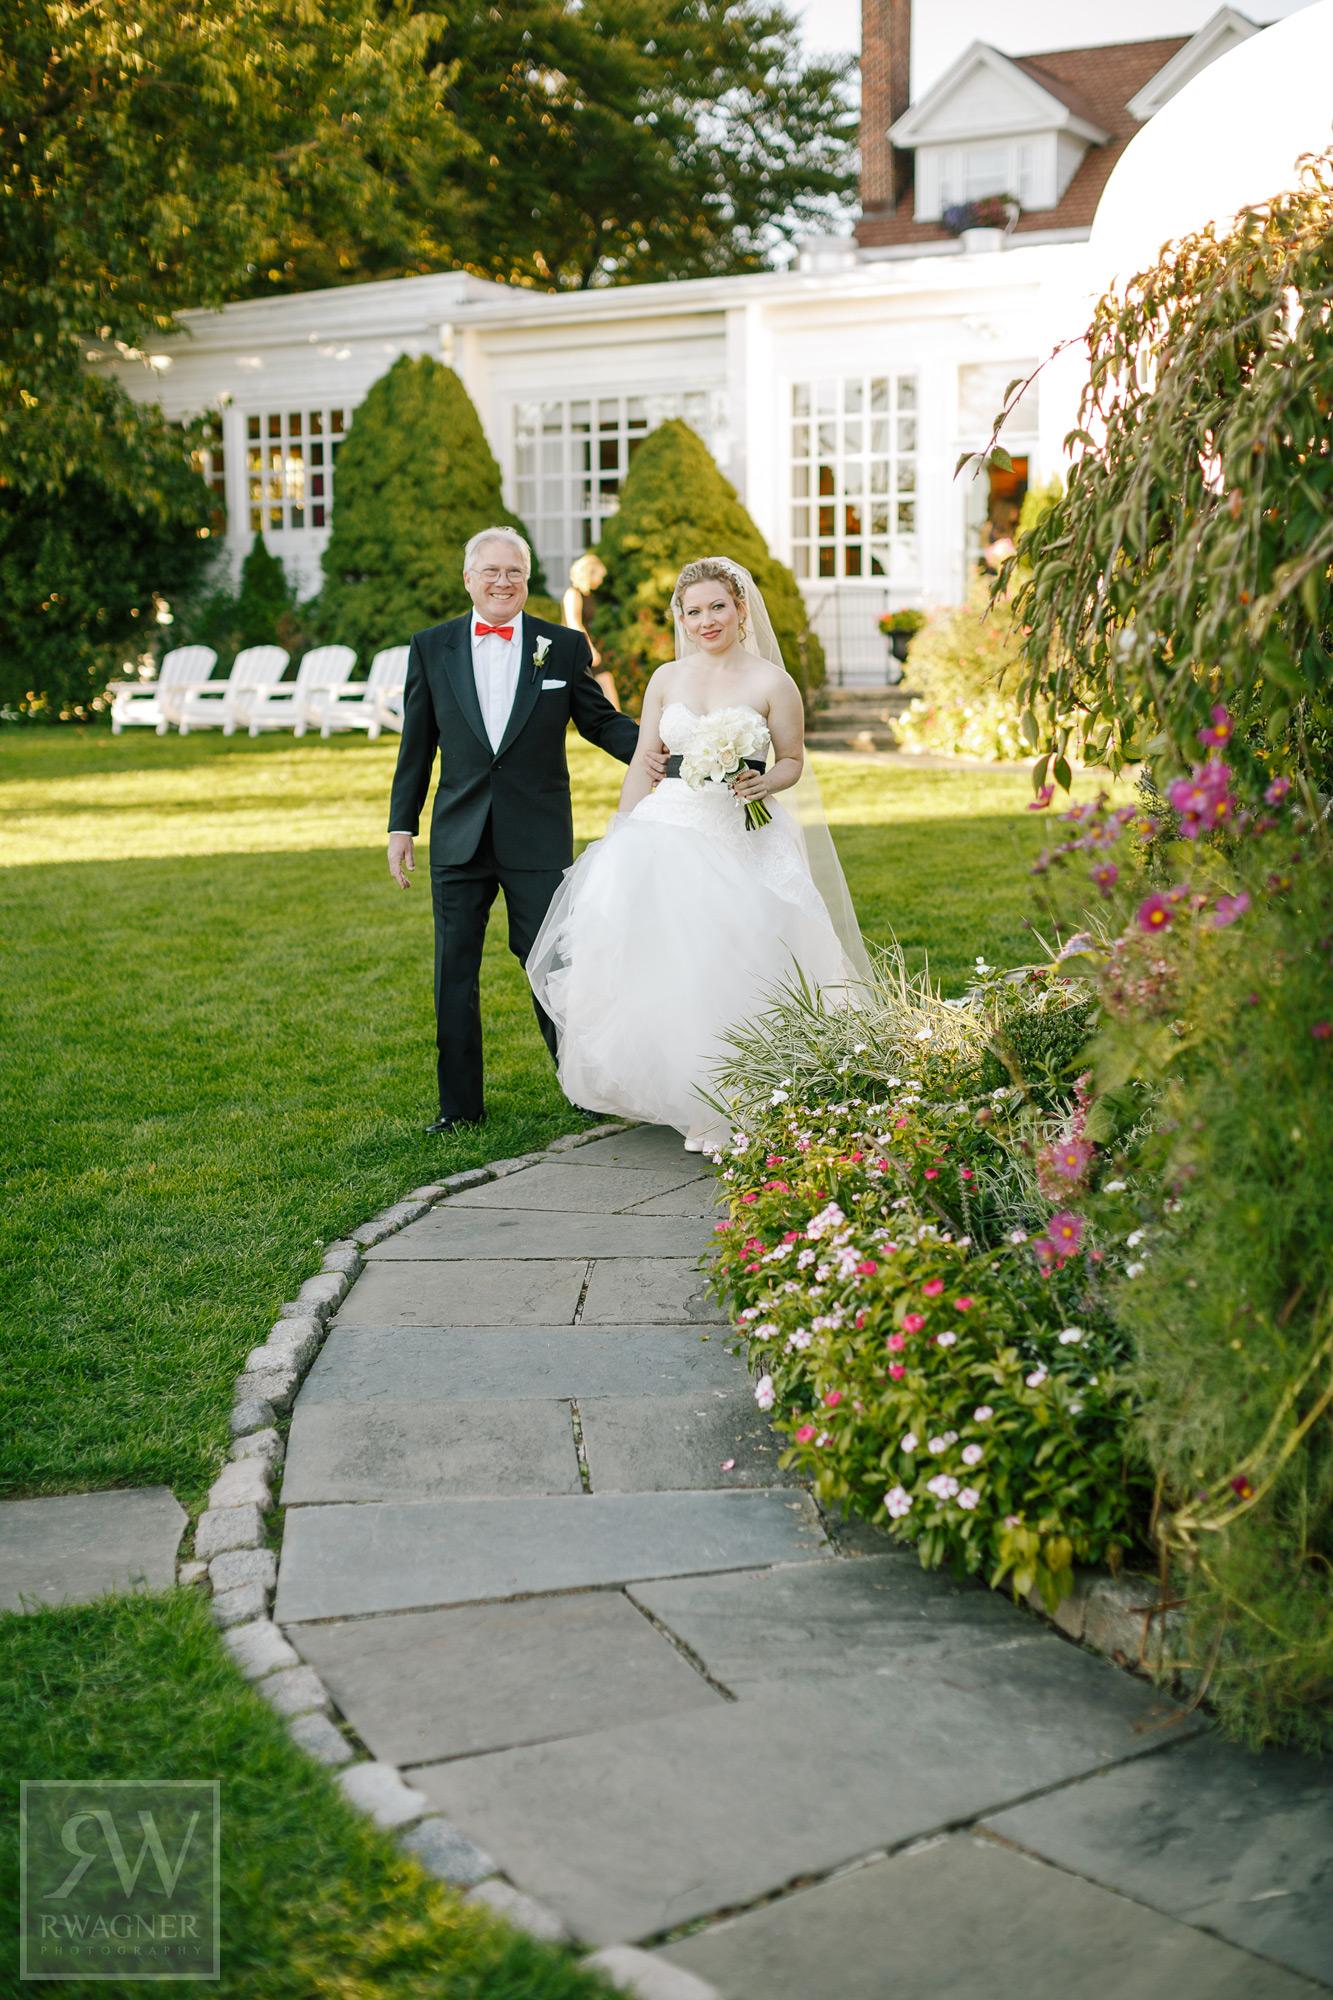 ceci_new_york_luxury_wedding_invitations_couture_red_black_white_real_wedding_dramatic_inn_at_longshore_v286_23.jpg